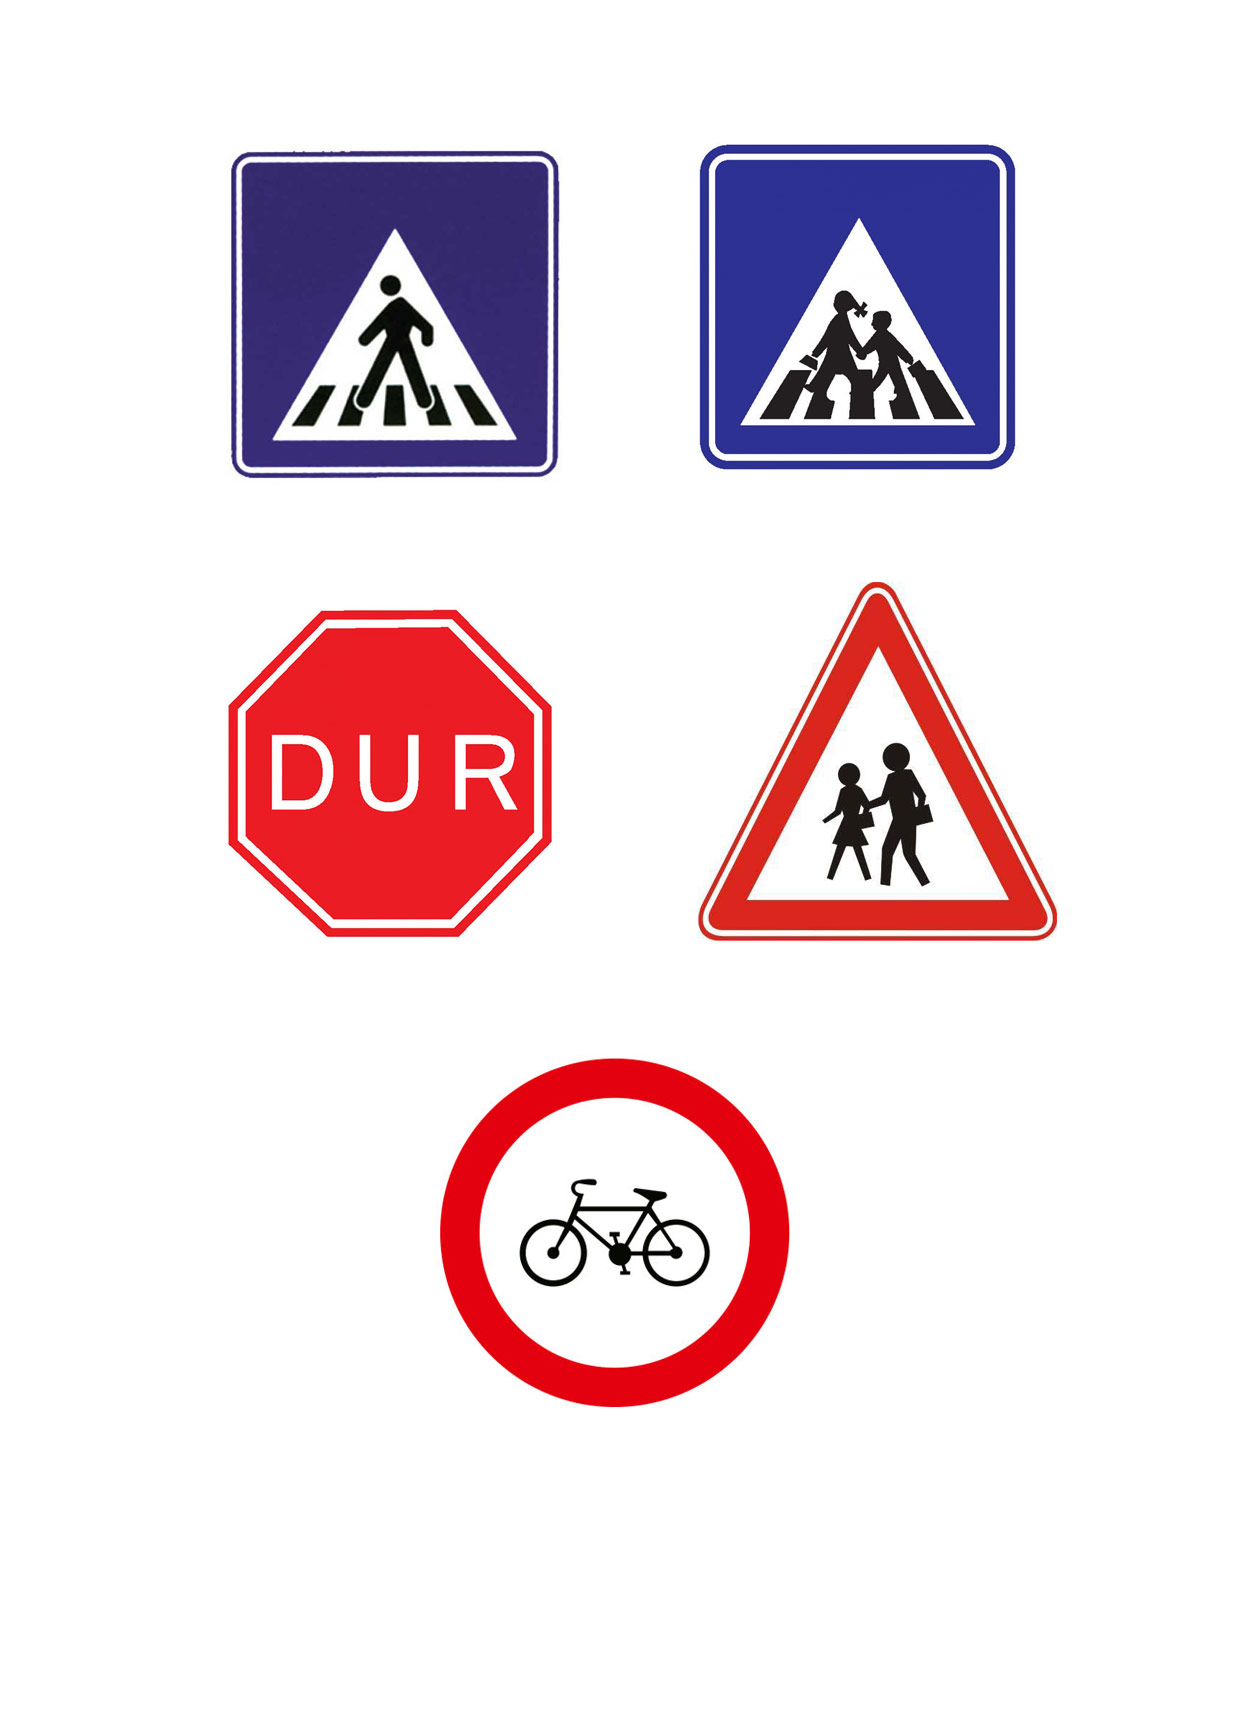 Trafik Isaretleri Adeland Renkler Dunyasi Projedenizi